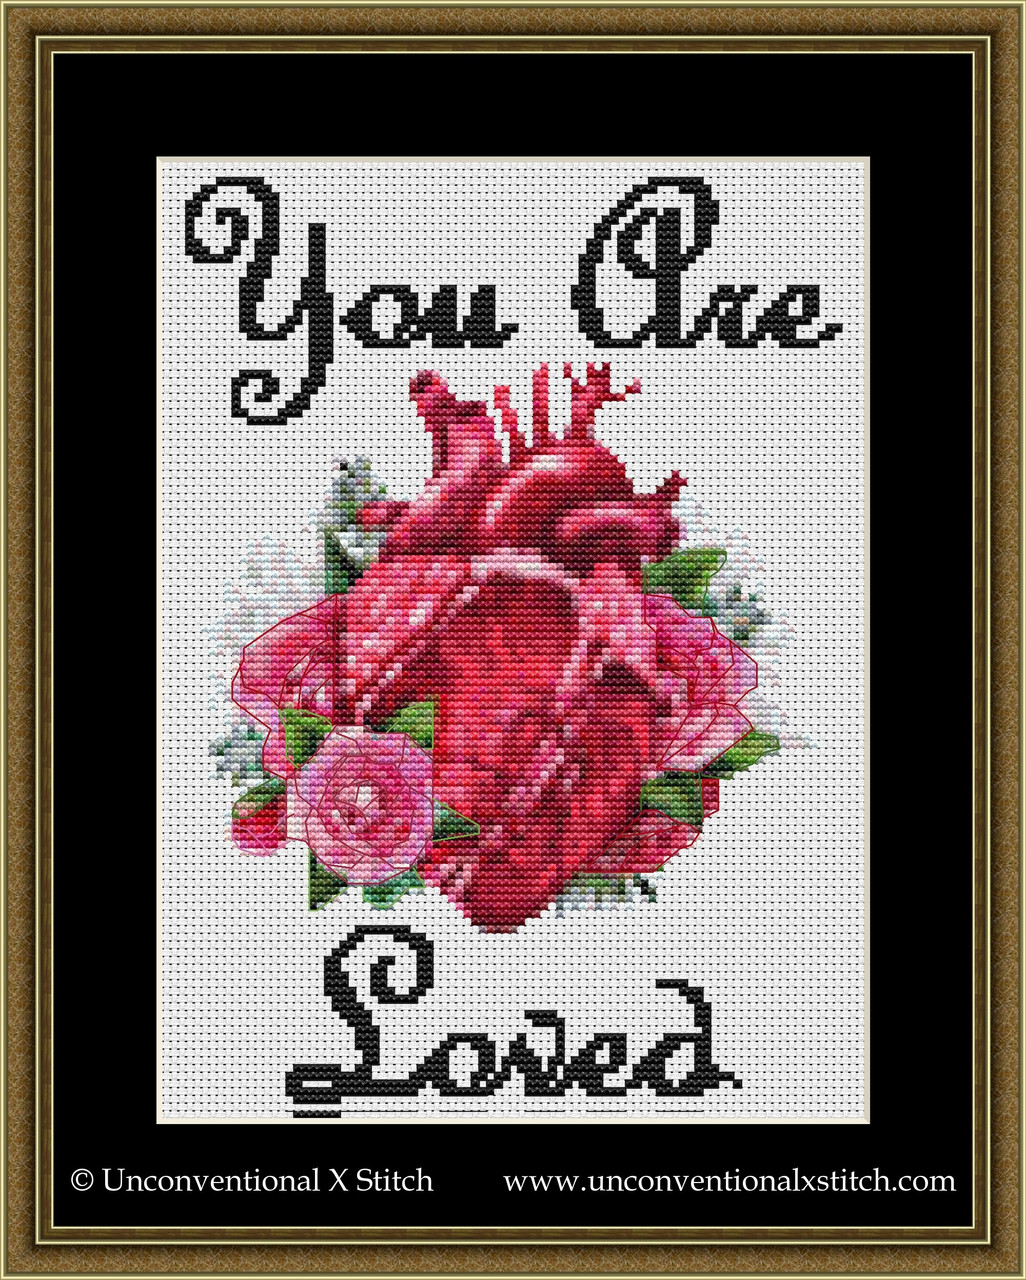 Cross Stitch Pattern Wizard Pattern You are so loved wizard Cross Stitch Pattern Funny cross stitch #005 Loved Pattern PDF